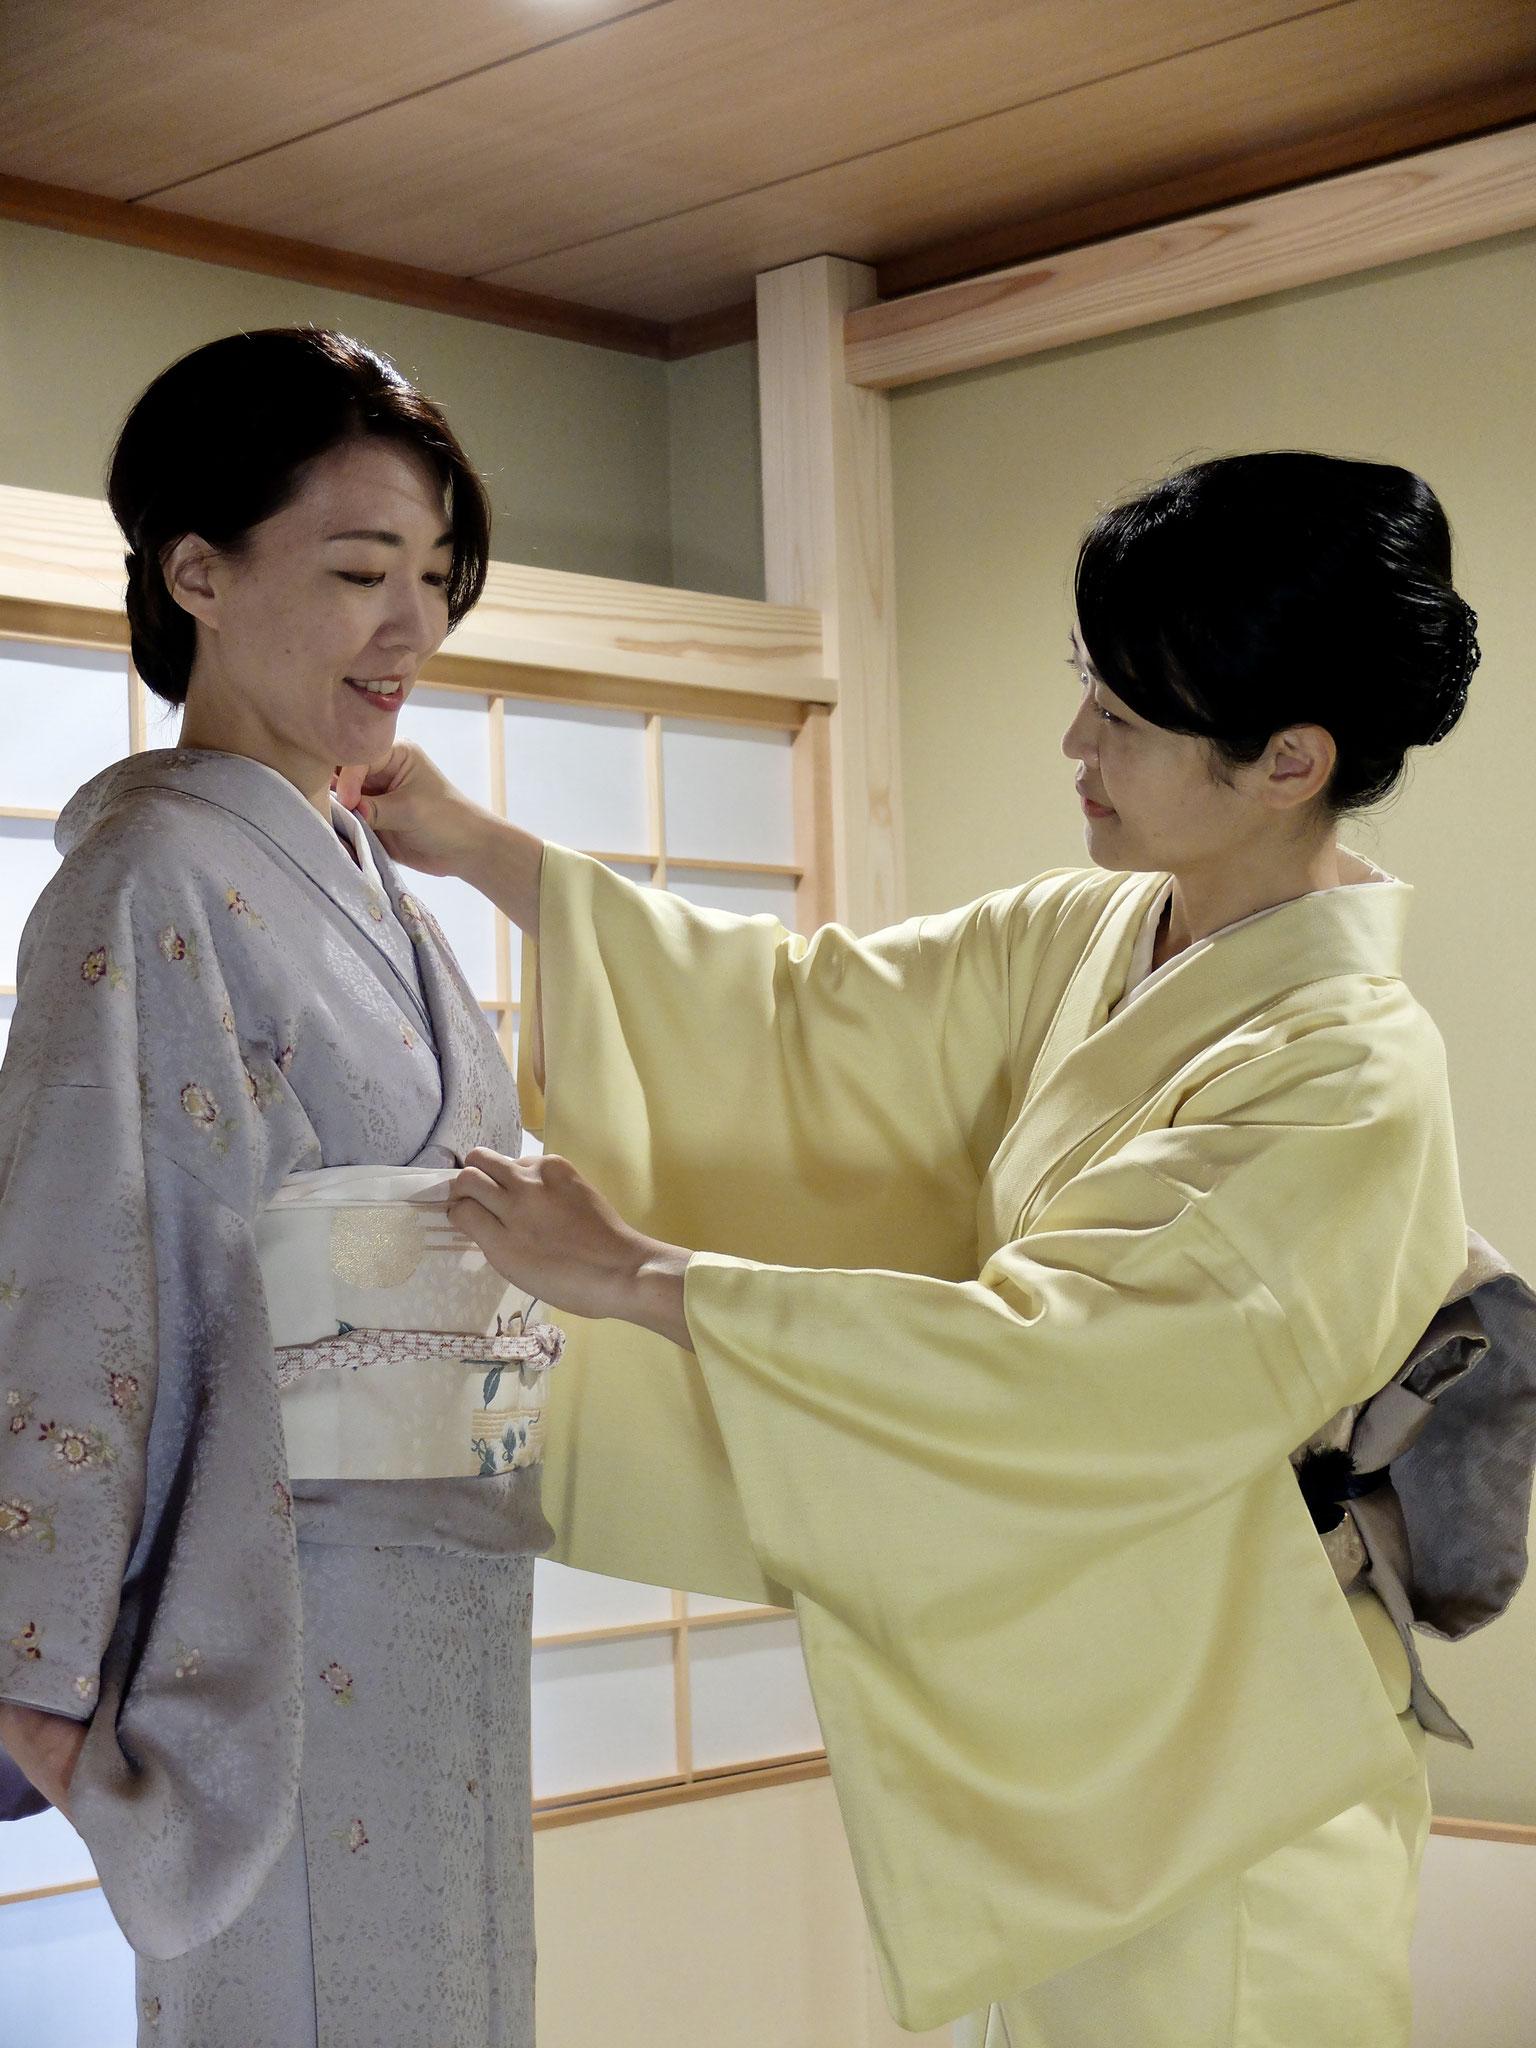 Kimono:  para vestirse Kimono a si mismo